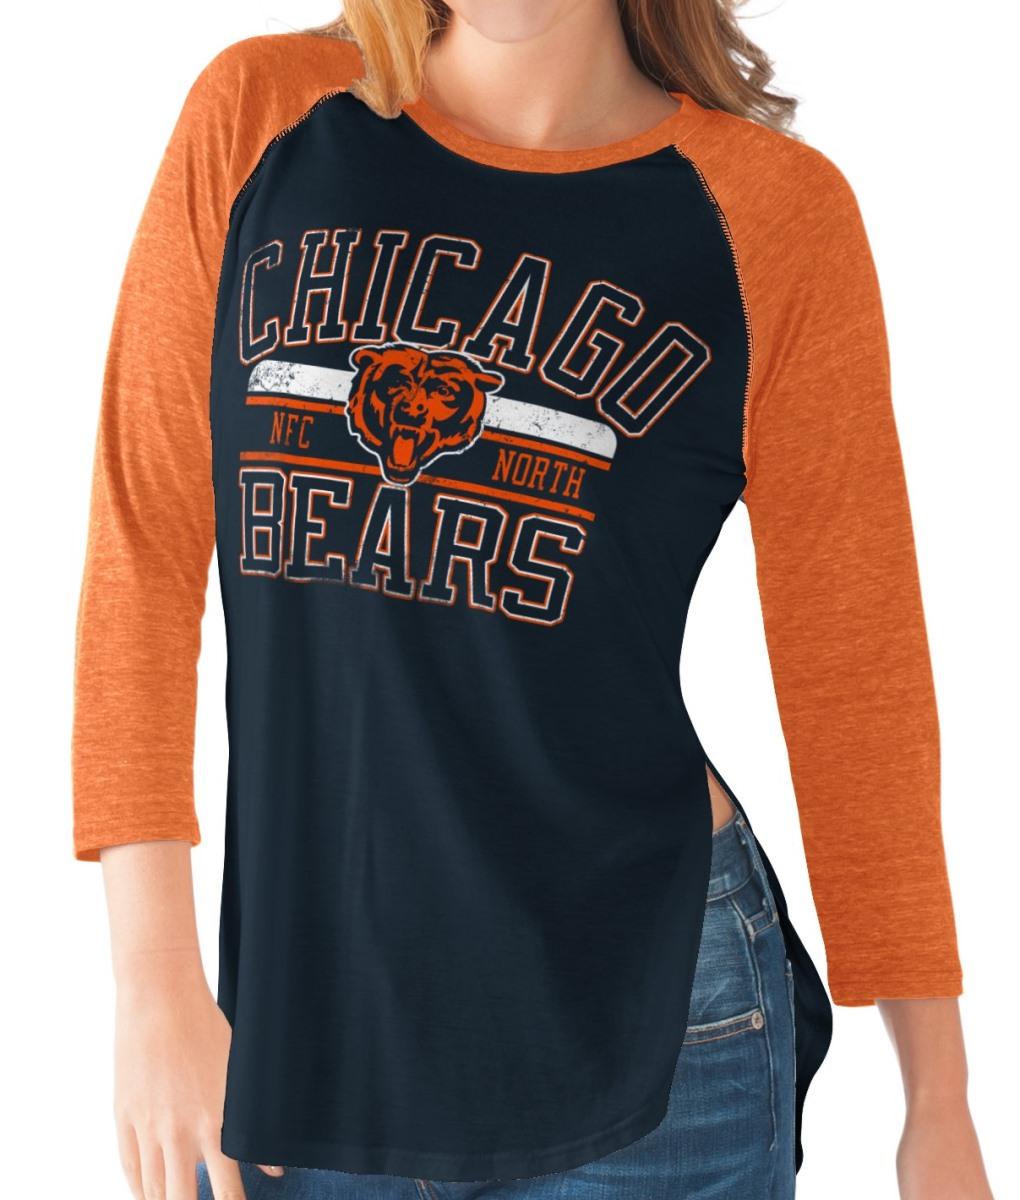 "Chicago Bears Women's G-III NFL ""Hang Time"" Dual blend 3 4 Sleeve T-shirt by G-III Sports"